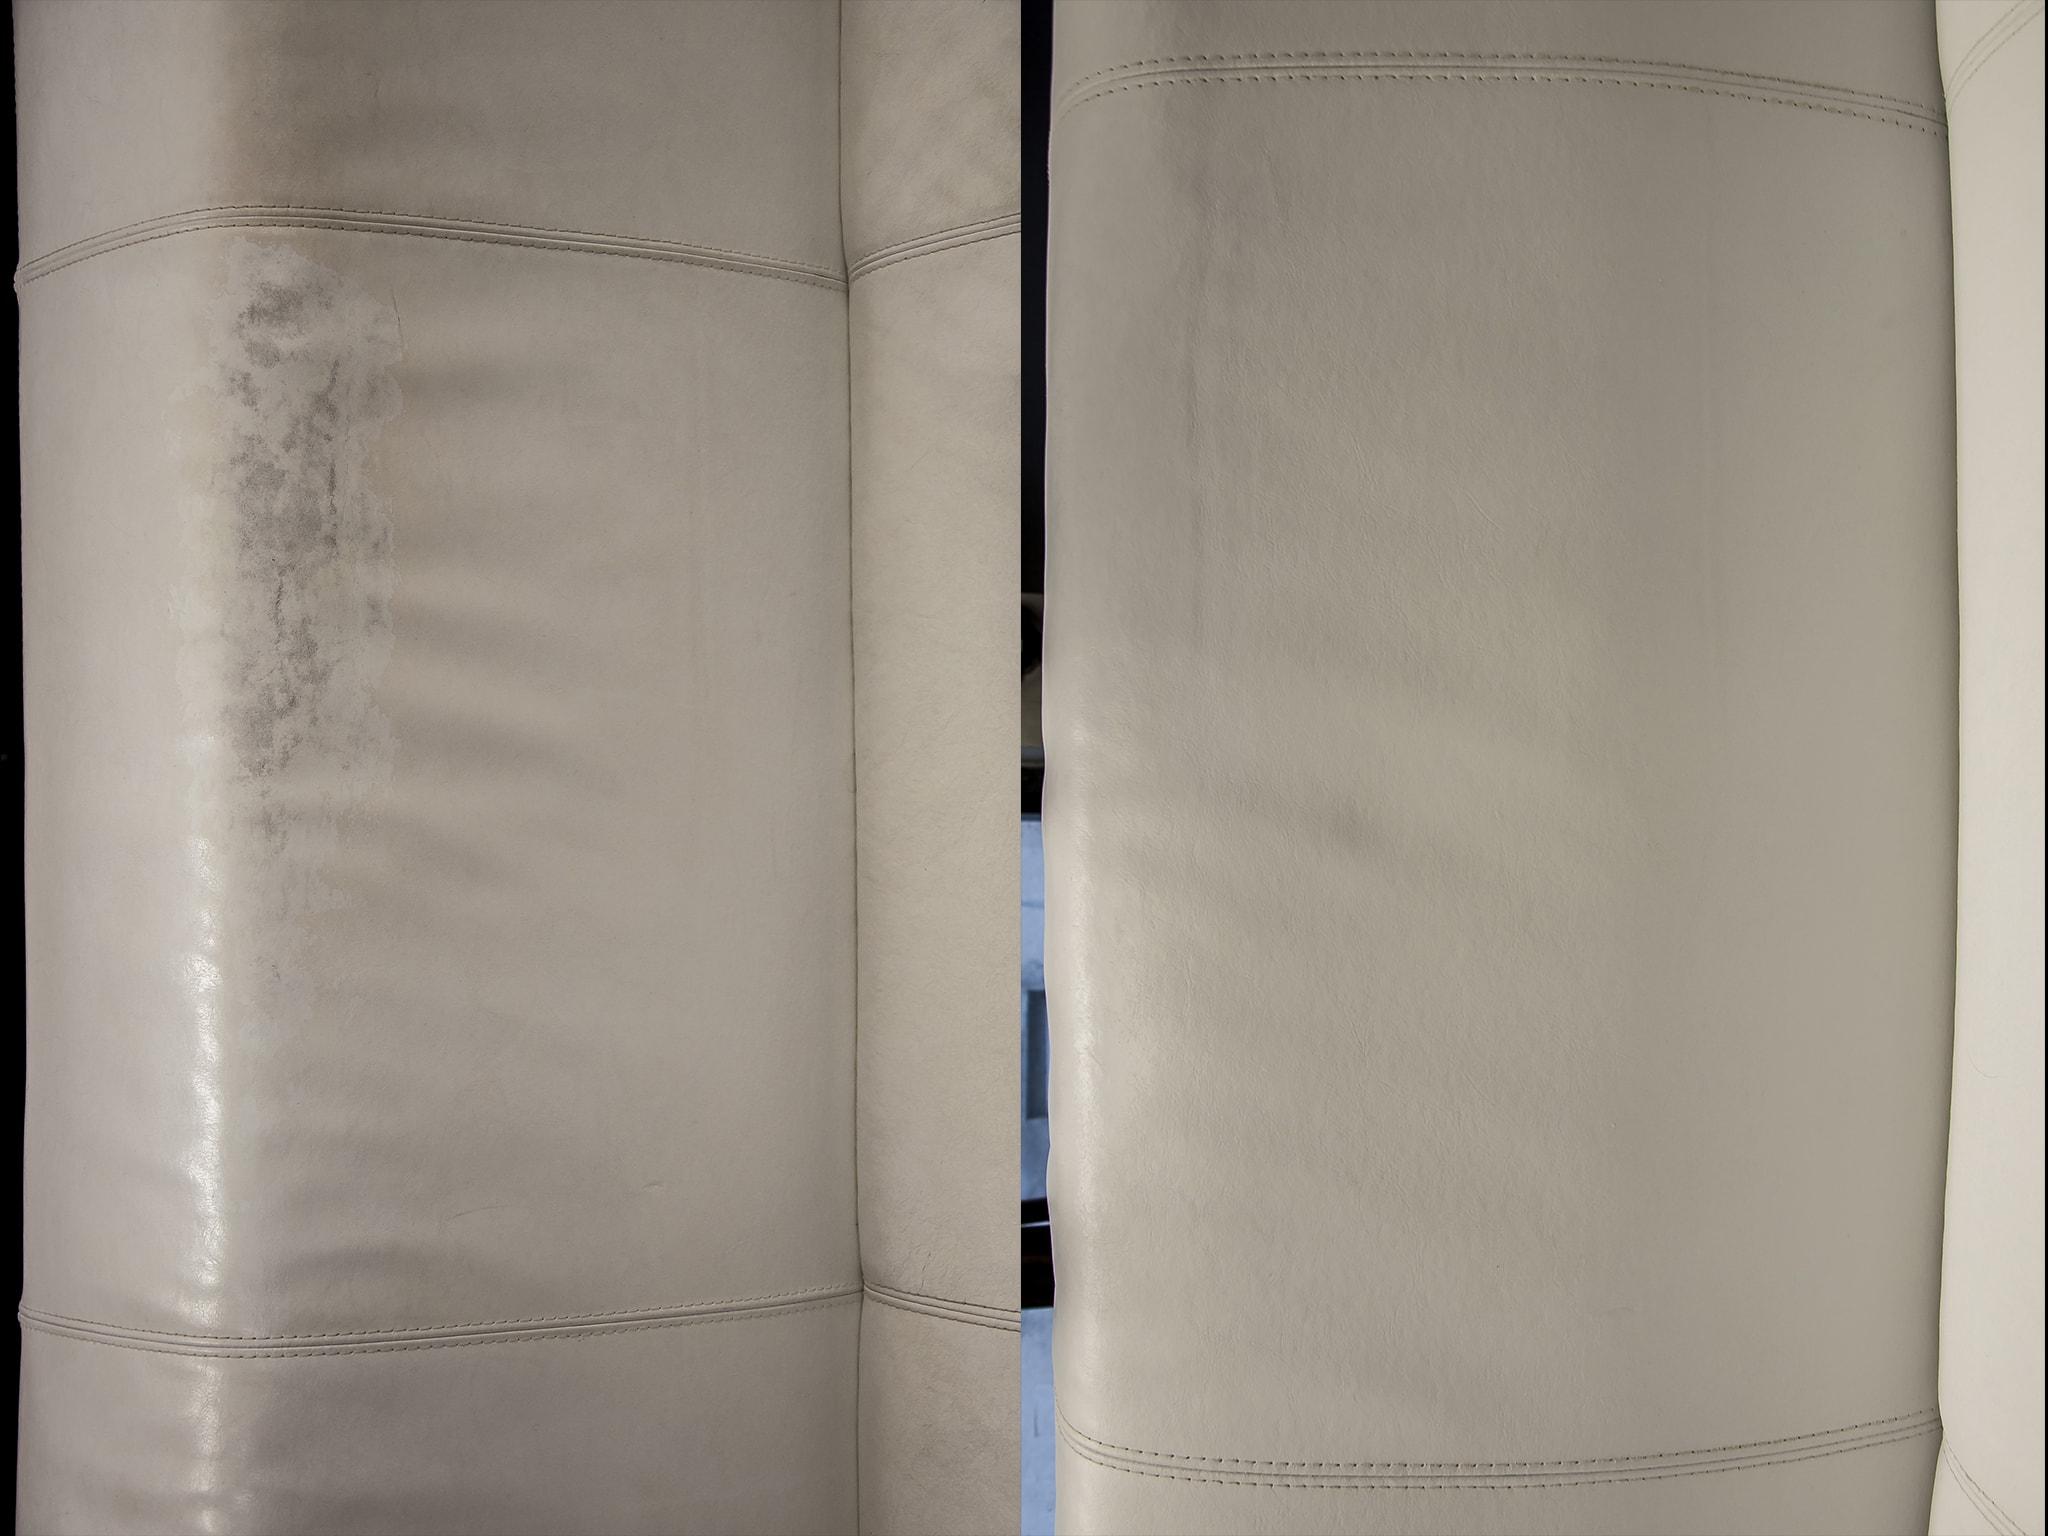 oprava kožené sedačky po použití přípravku 2v1